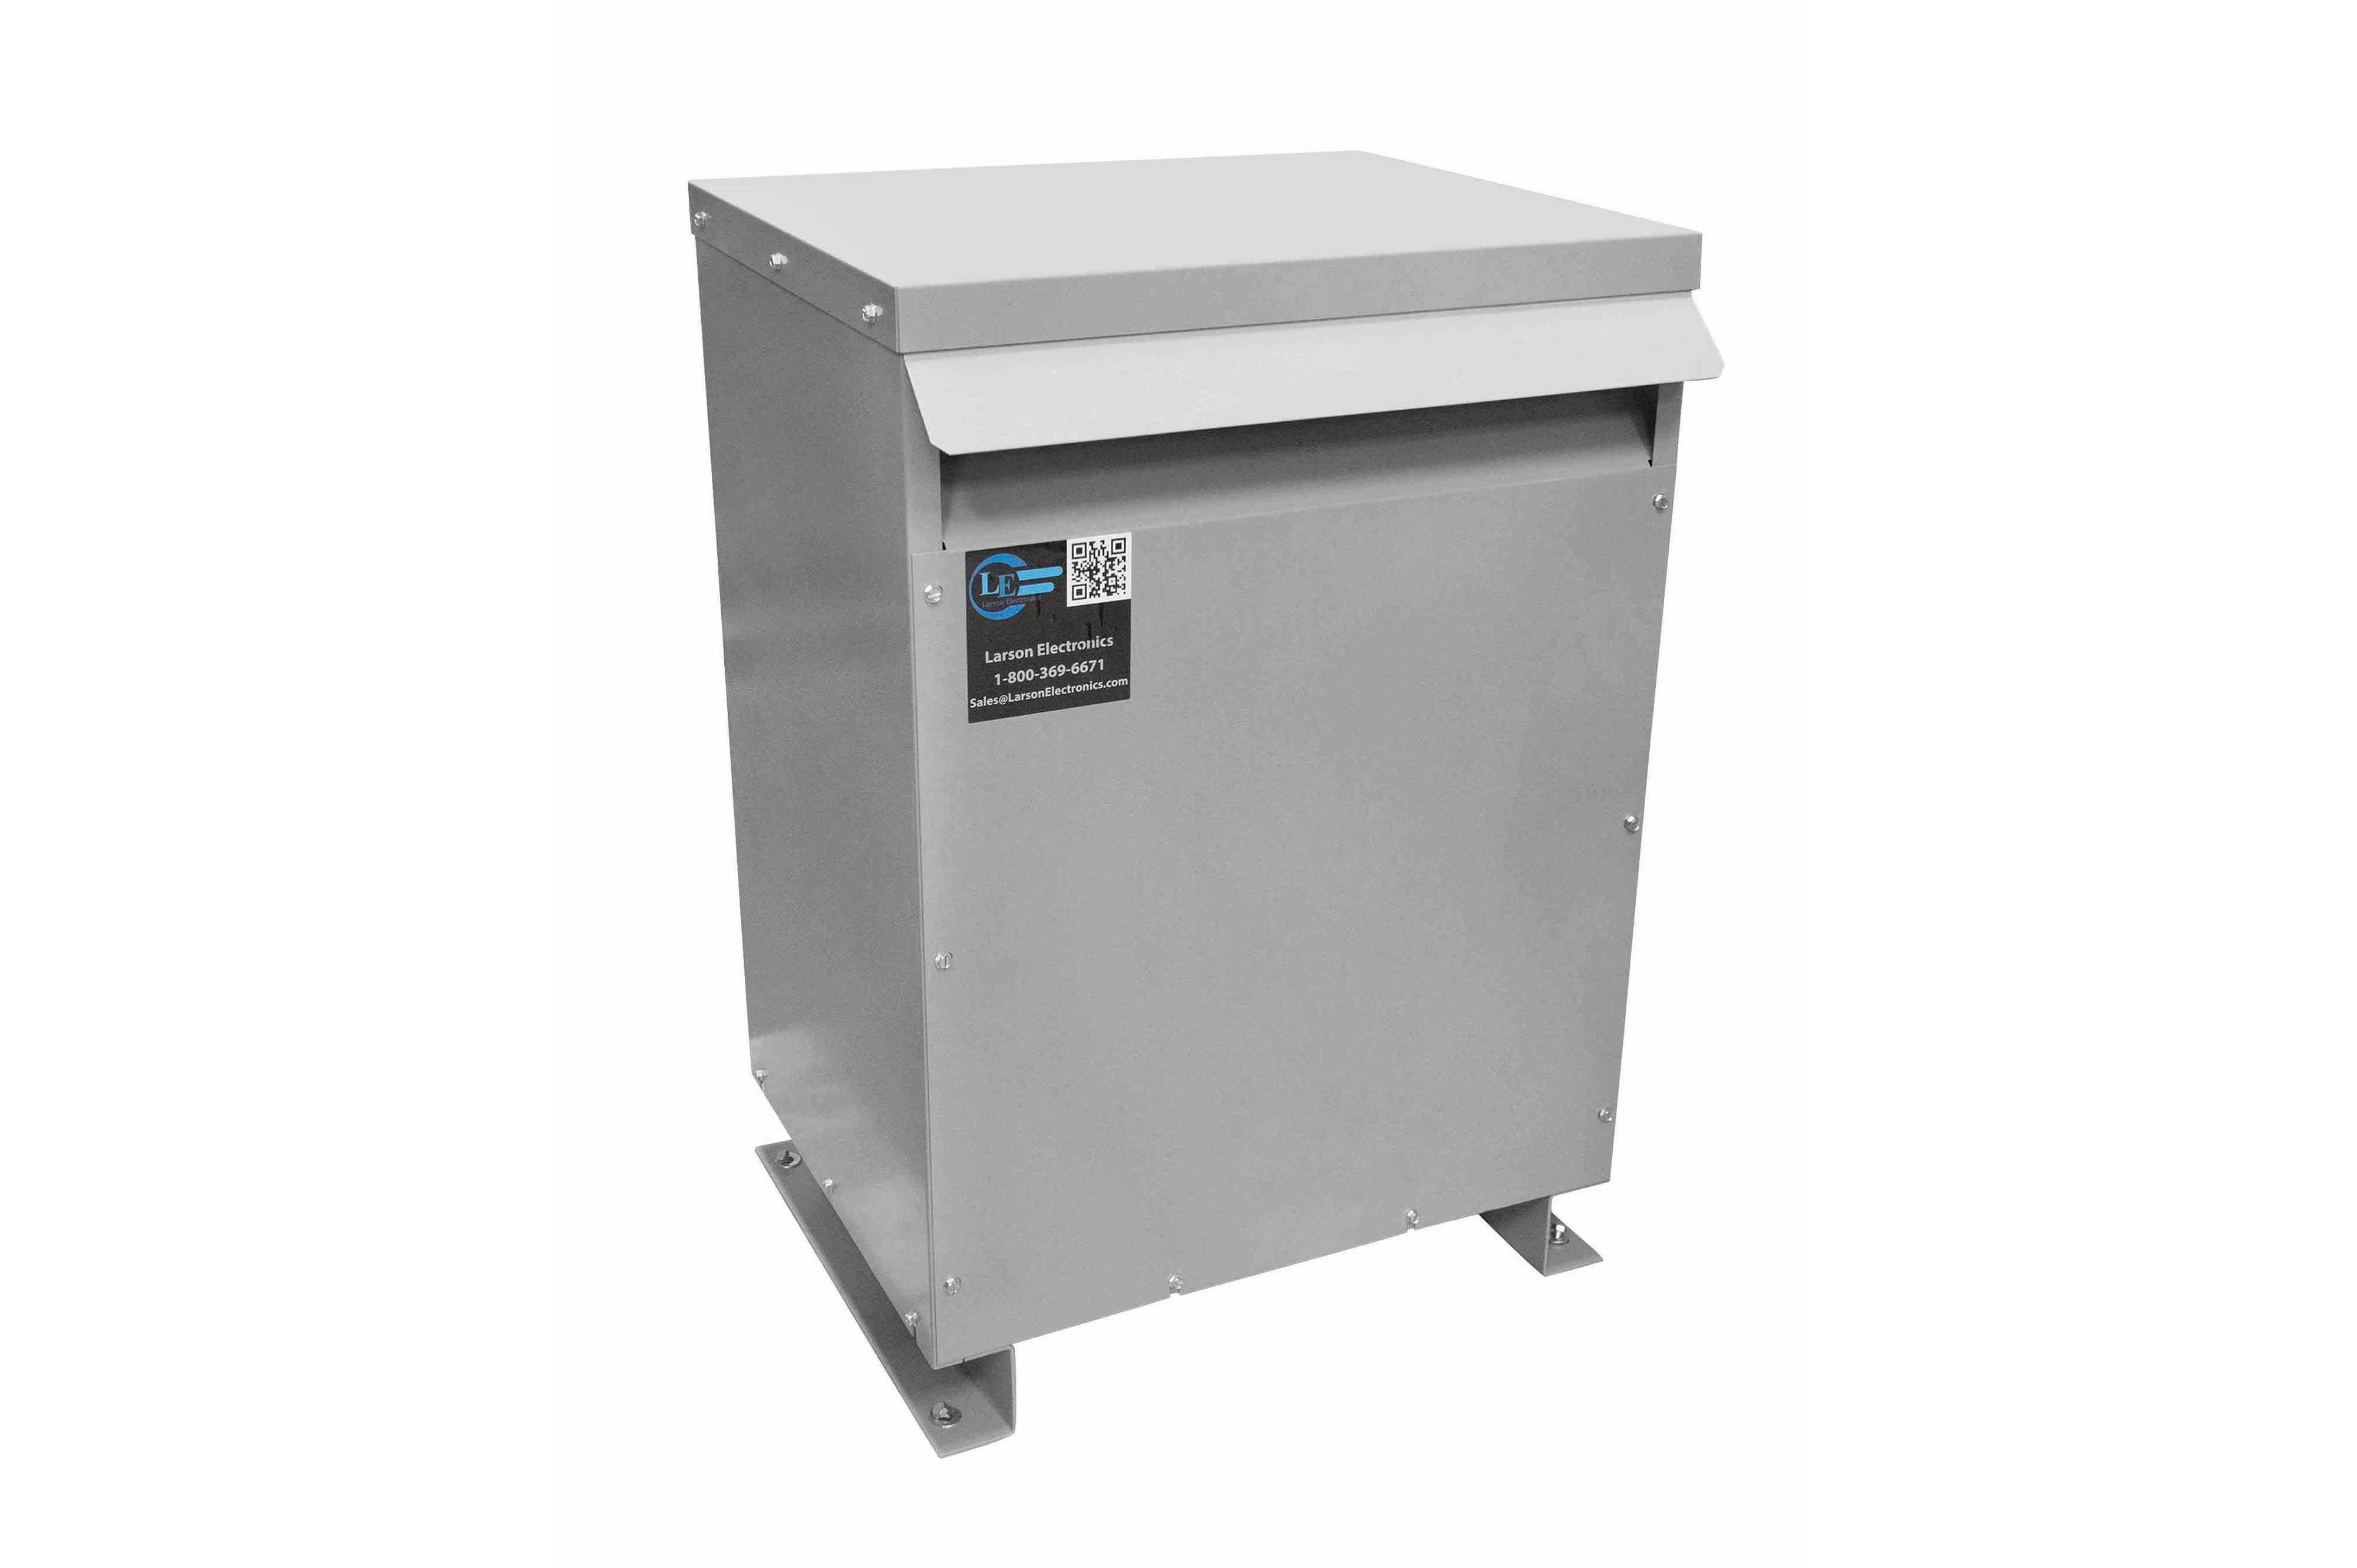 125 kVA 3PH Isolation Transformer, 400V Wye Primary, 208Y/120 Wye-N Secondary, N3R, Ventilated, 60 Hz